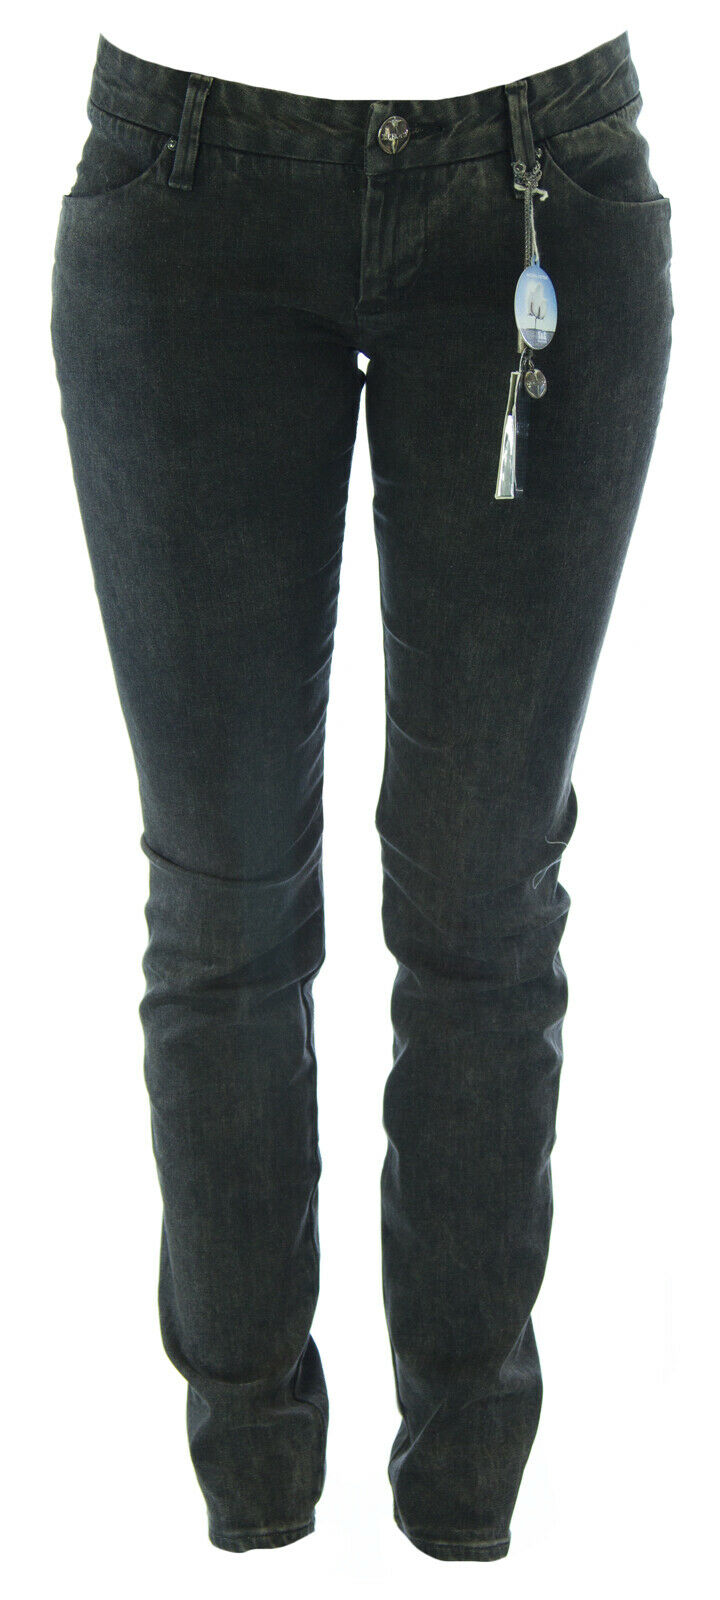 Lerock Donna Nero Sbiadito Gamba Gamba Gamba Dritta Slim Denim Jeans Taglie 27 Nuovo afd7fa